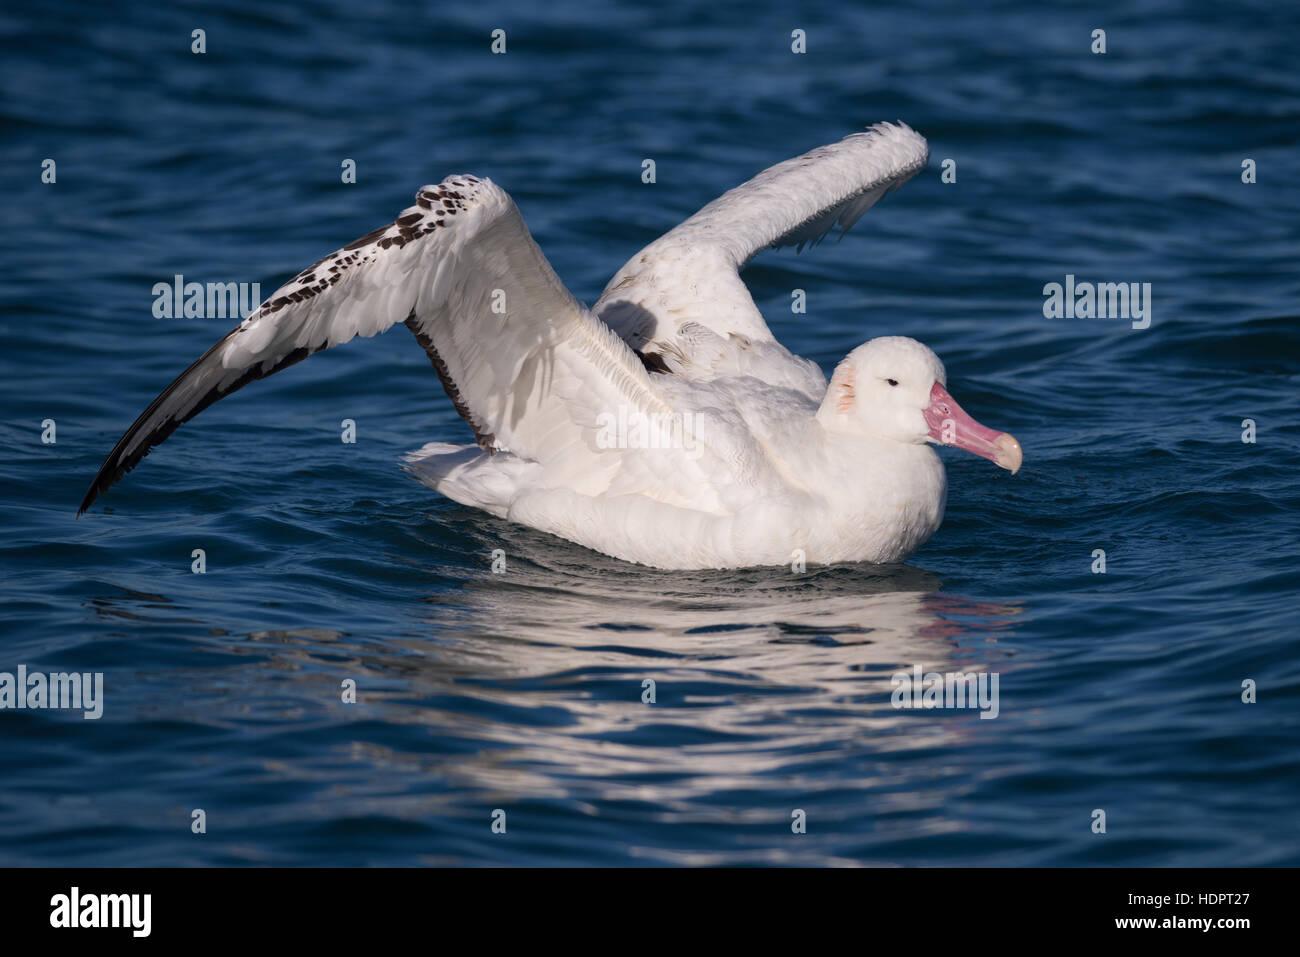 An adult Wandering Albatross floating on the ocean - Stock Image